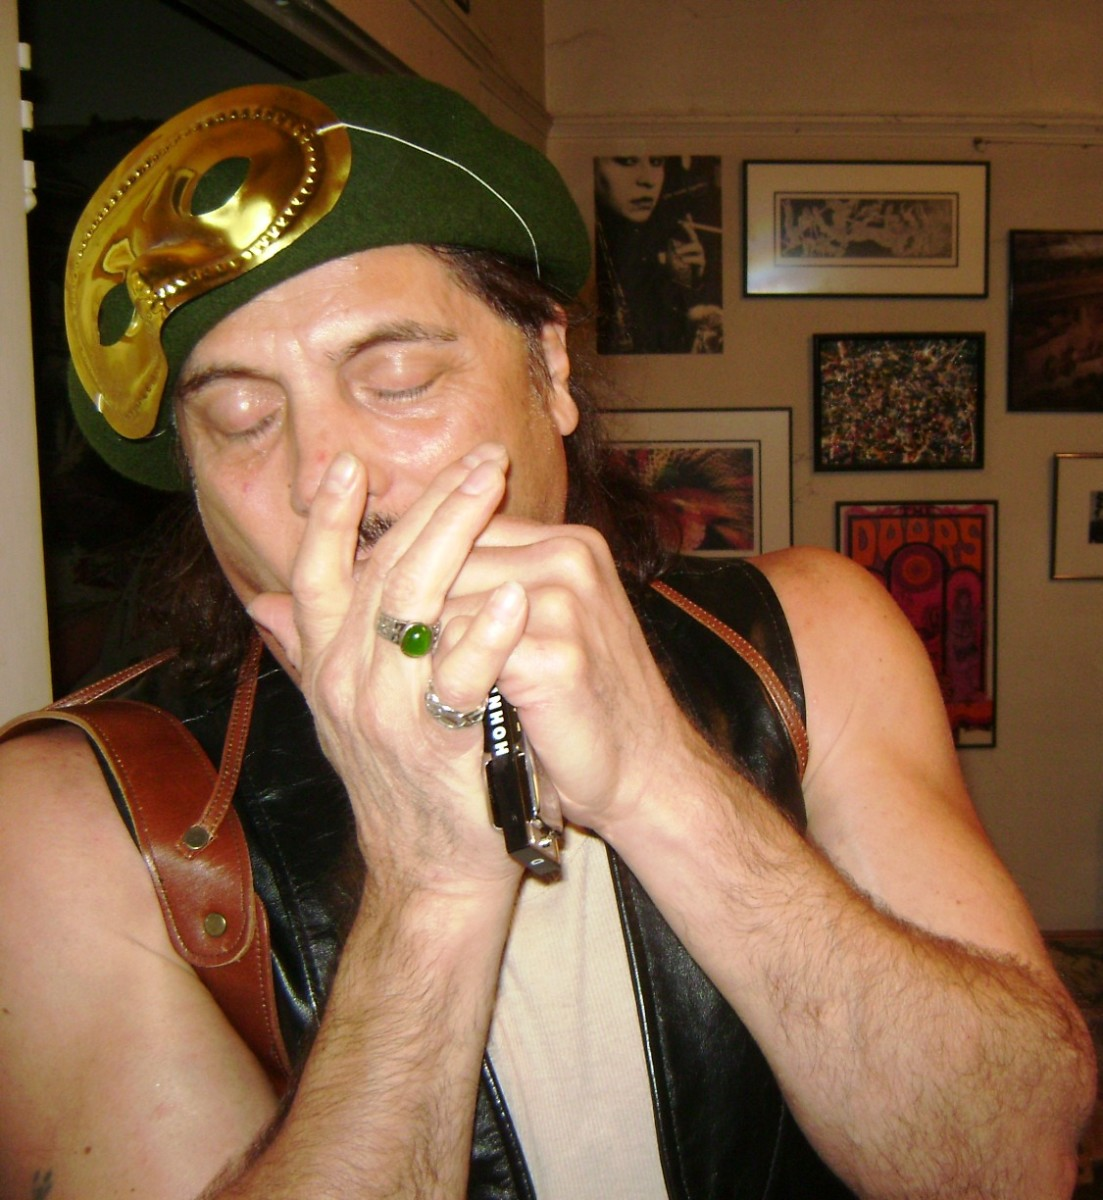 Luke plays the harmonica